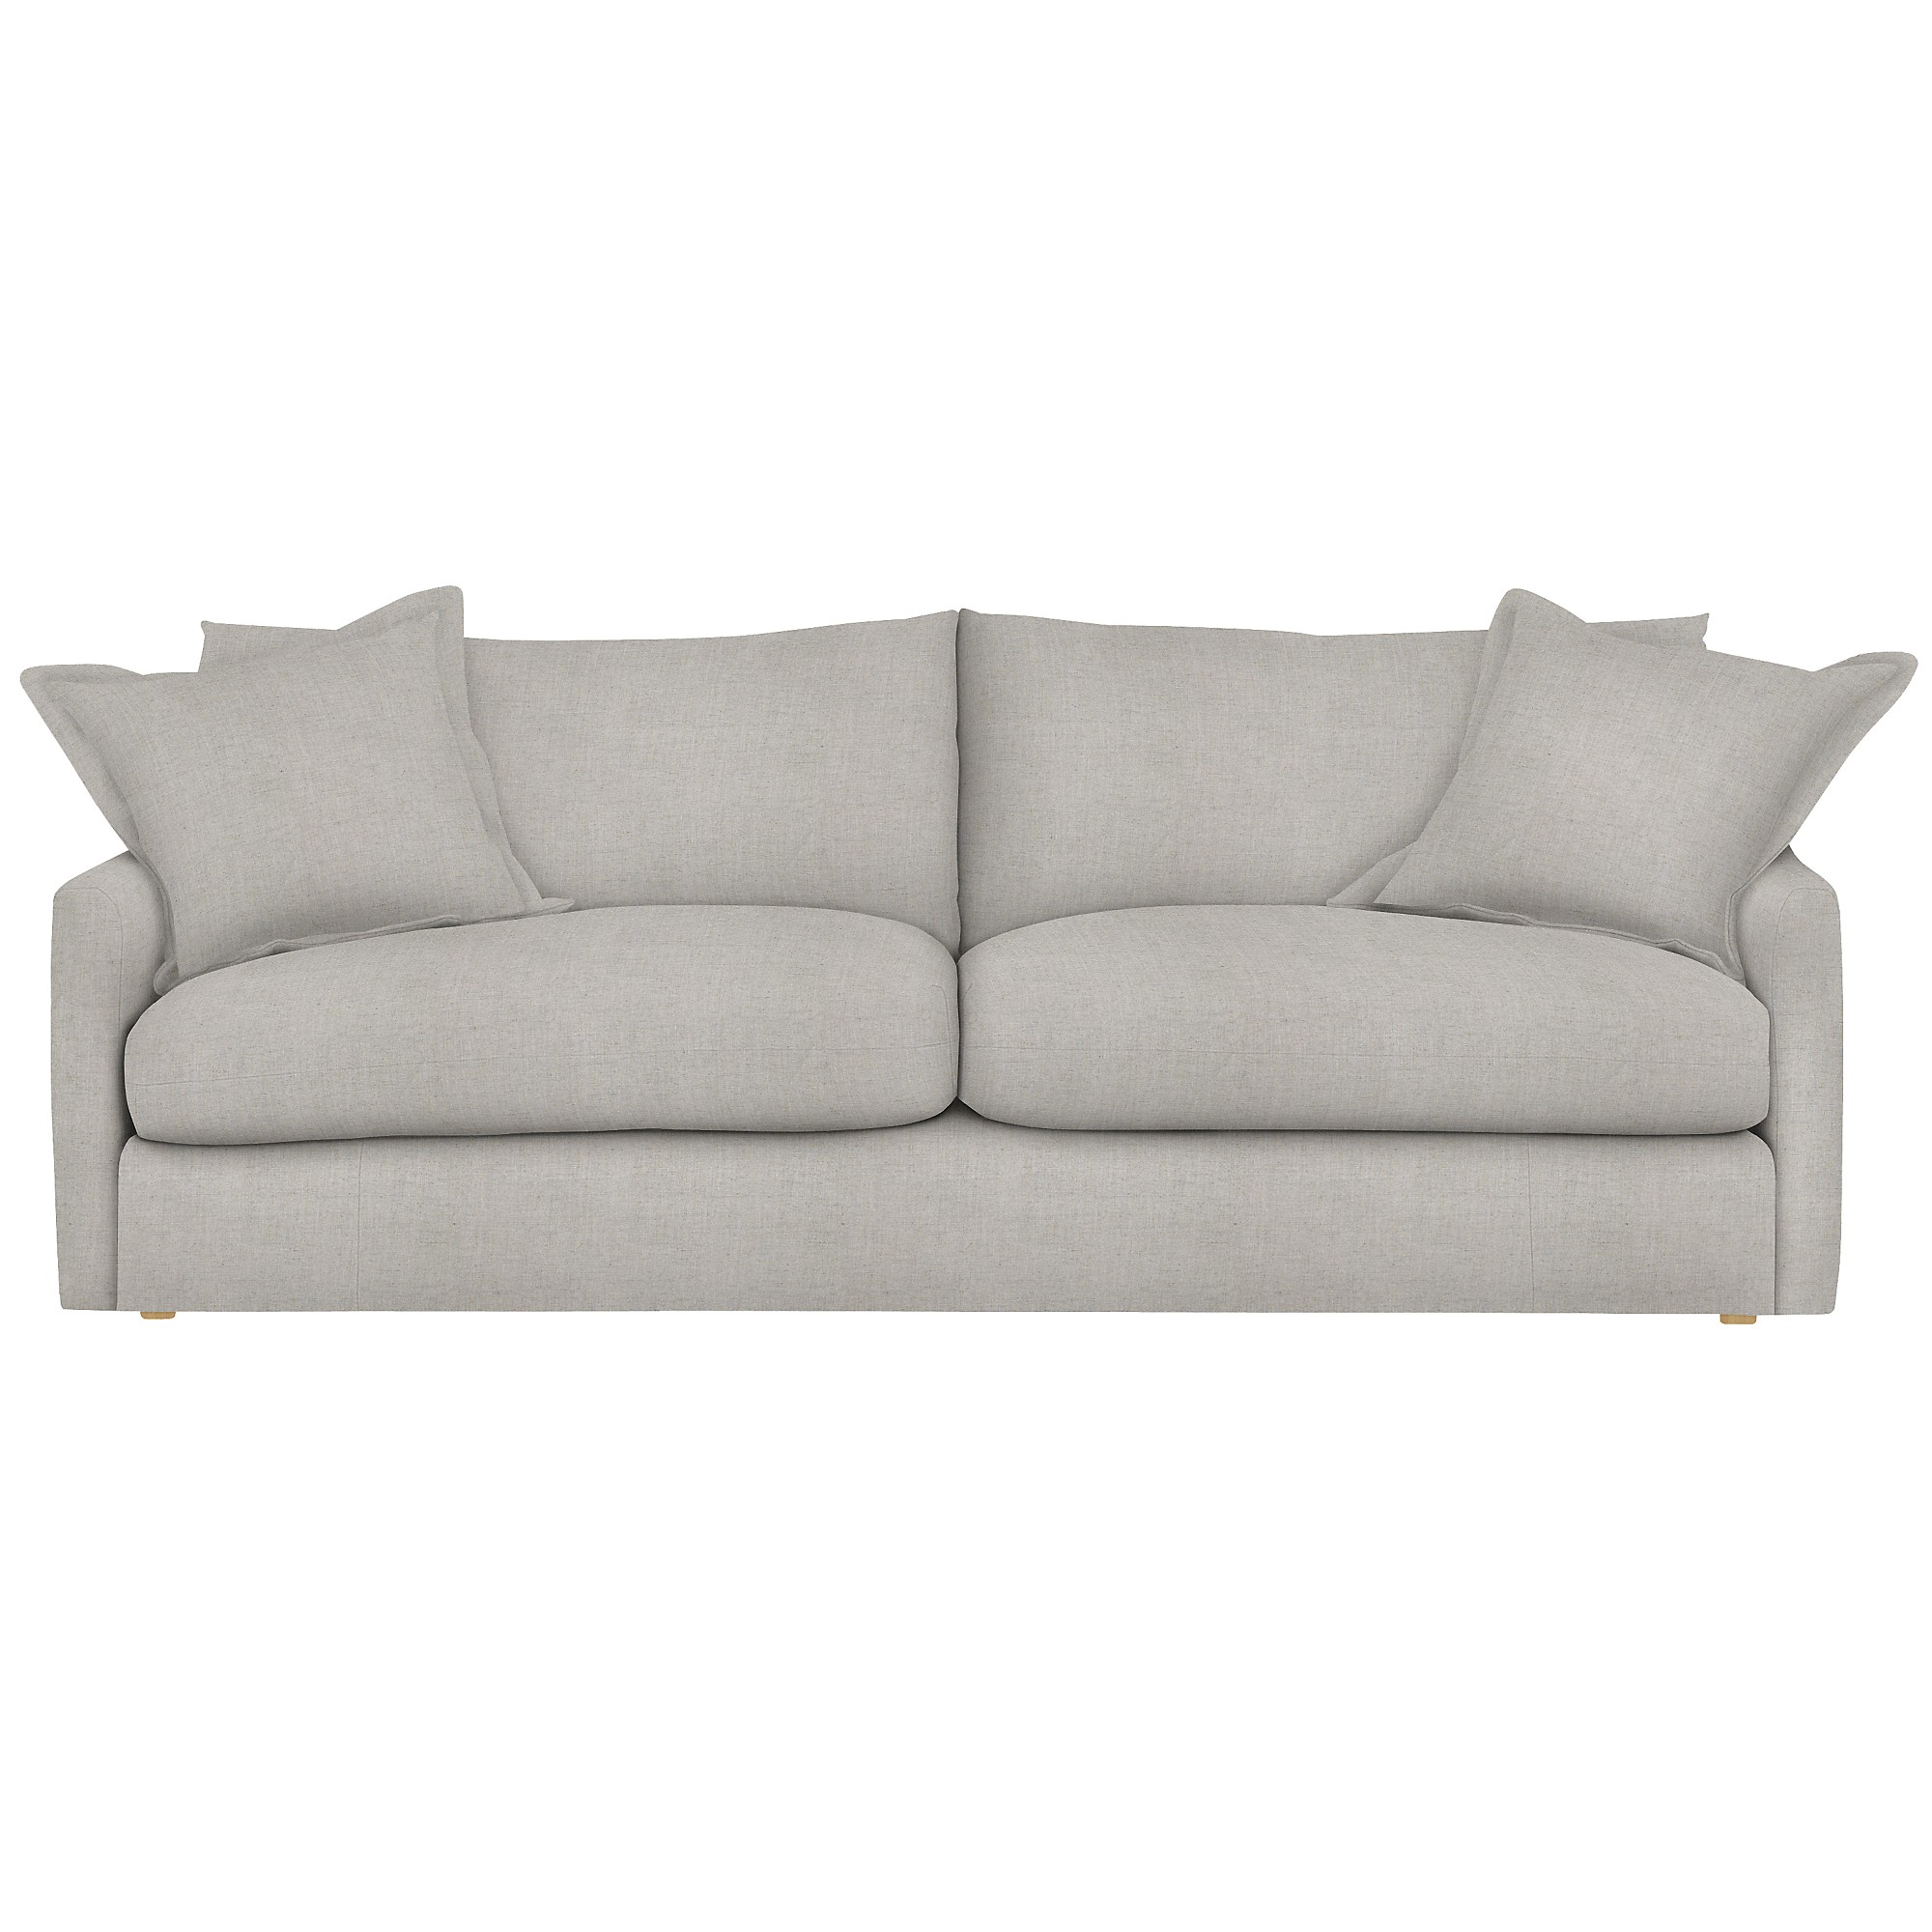 John Lewis Inverness Grand Loose Cover Sofa